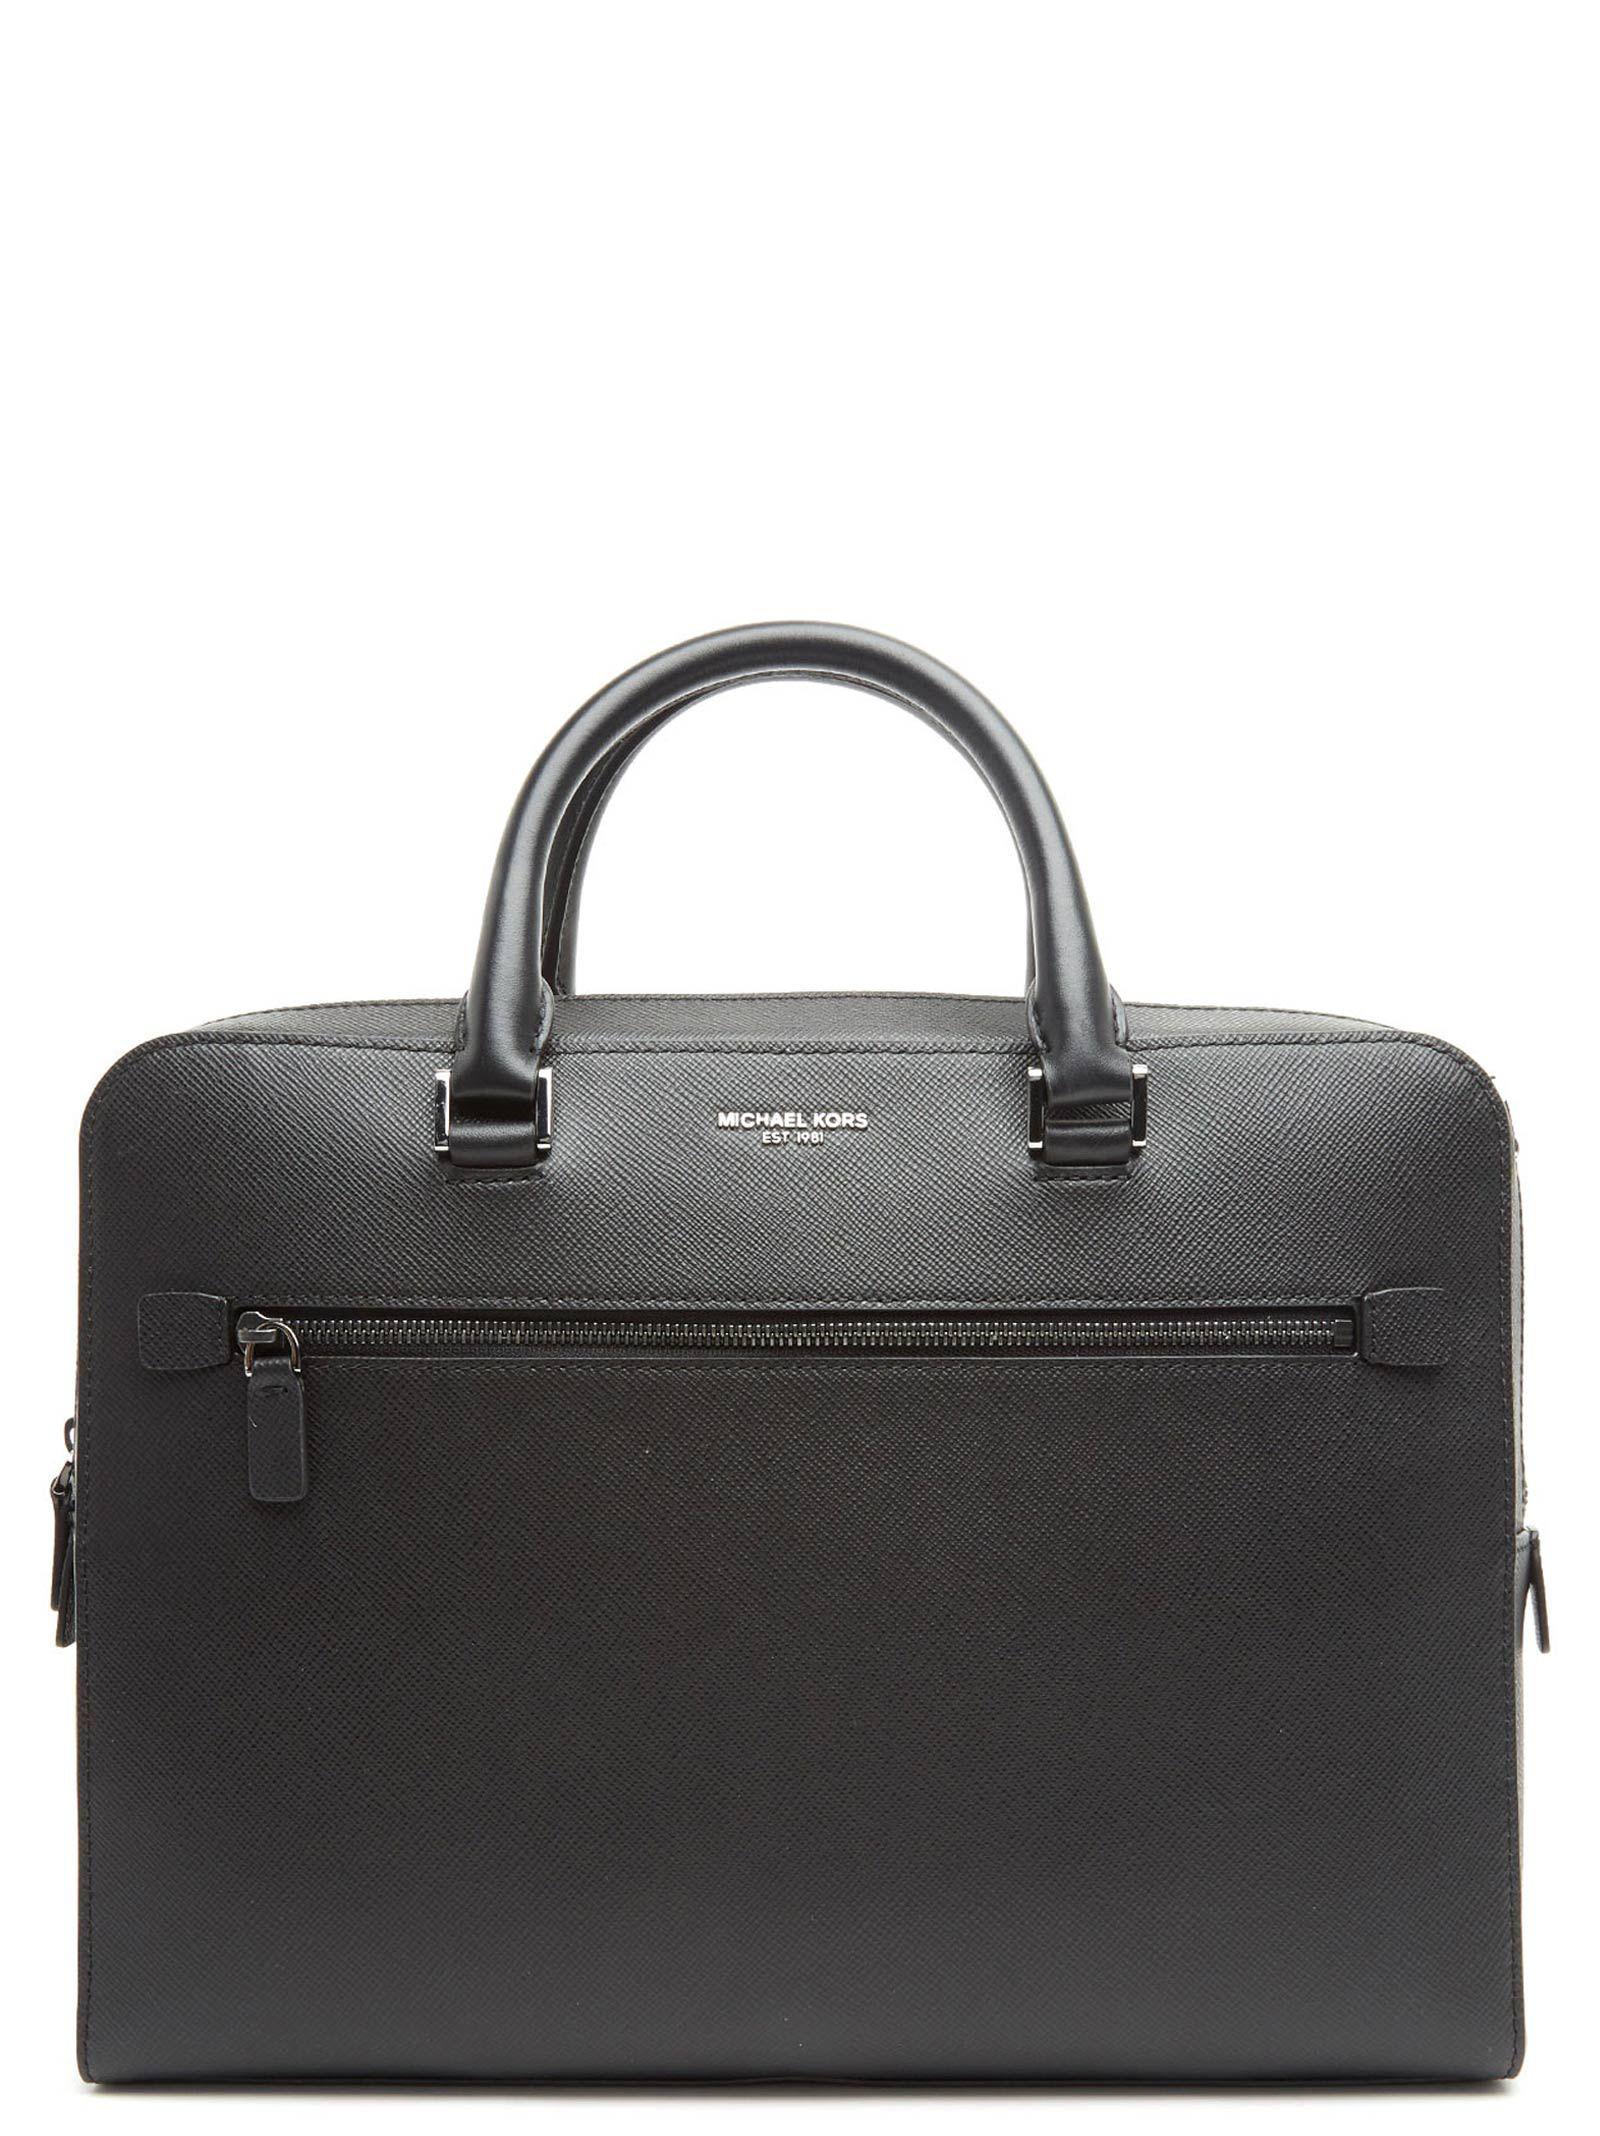 Michael Kors Harrison Bag